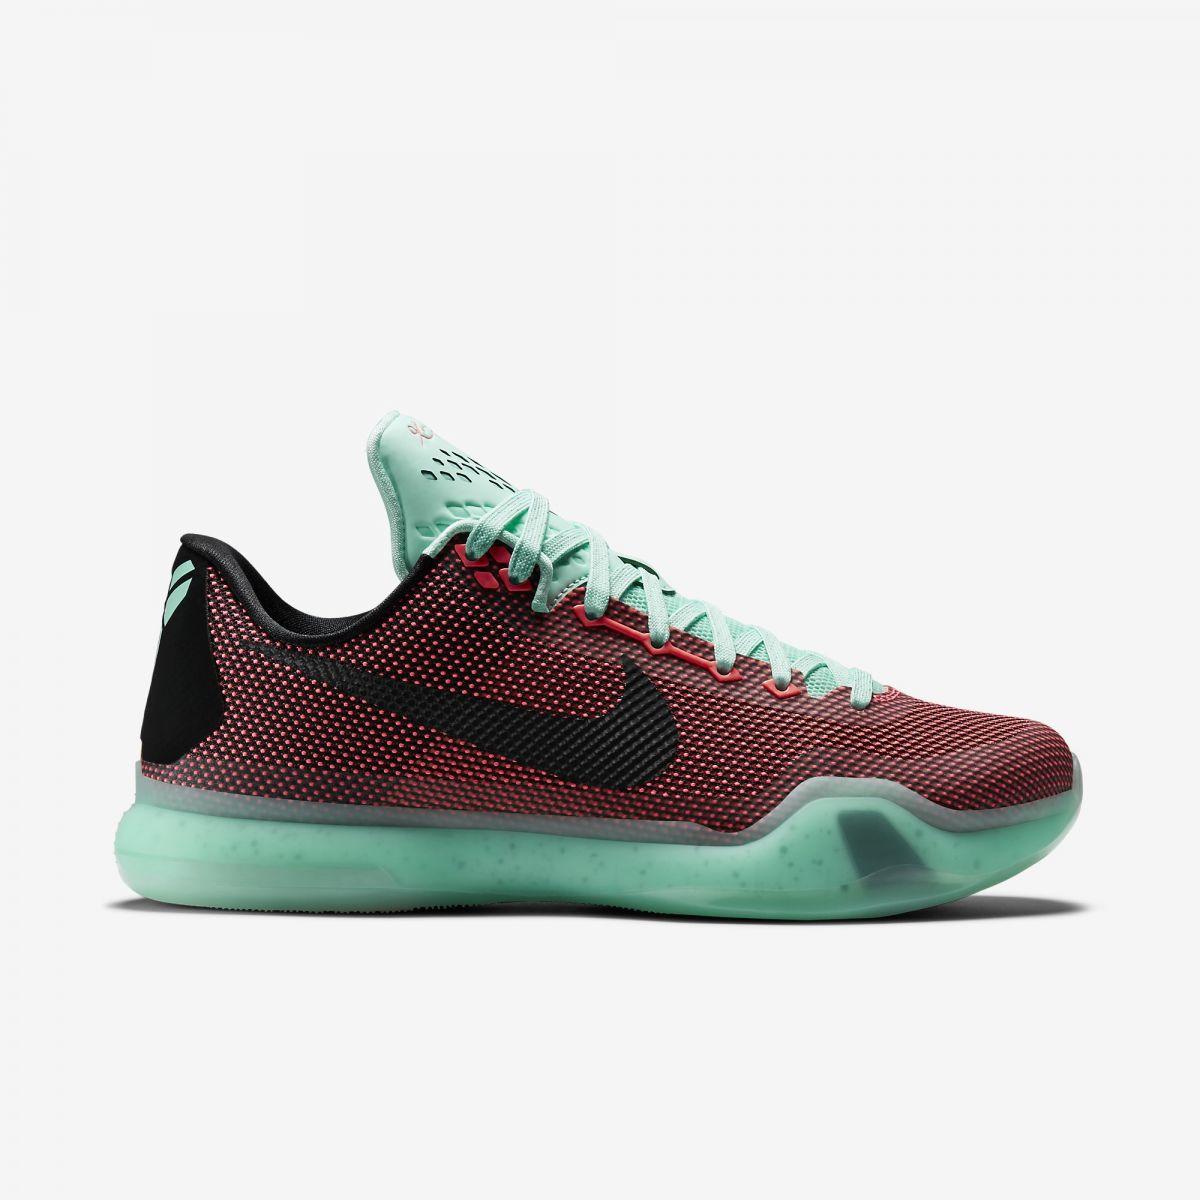 Nike Kobe 10 Easter Hot Lava Black Sunset Glow